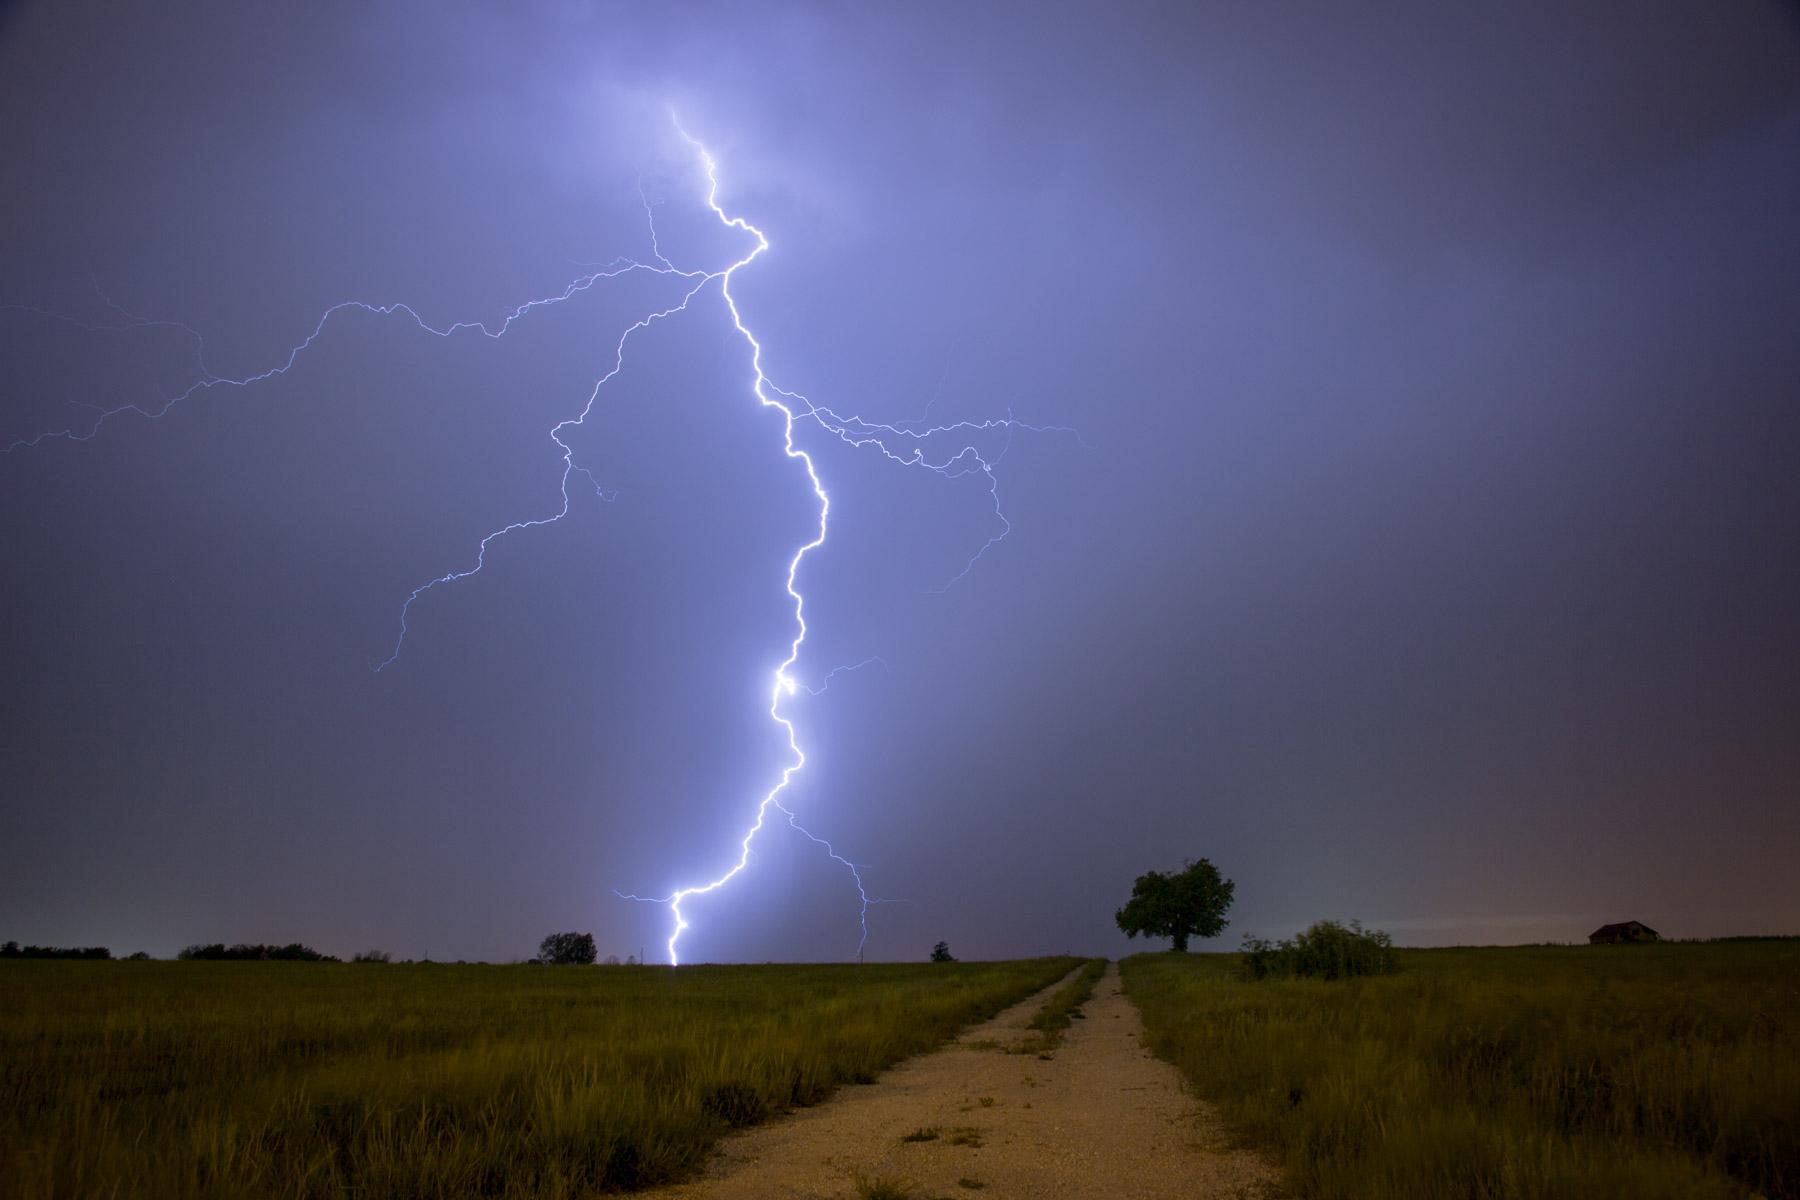 Lightning strikes in the dark